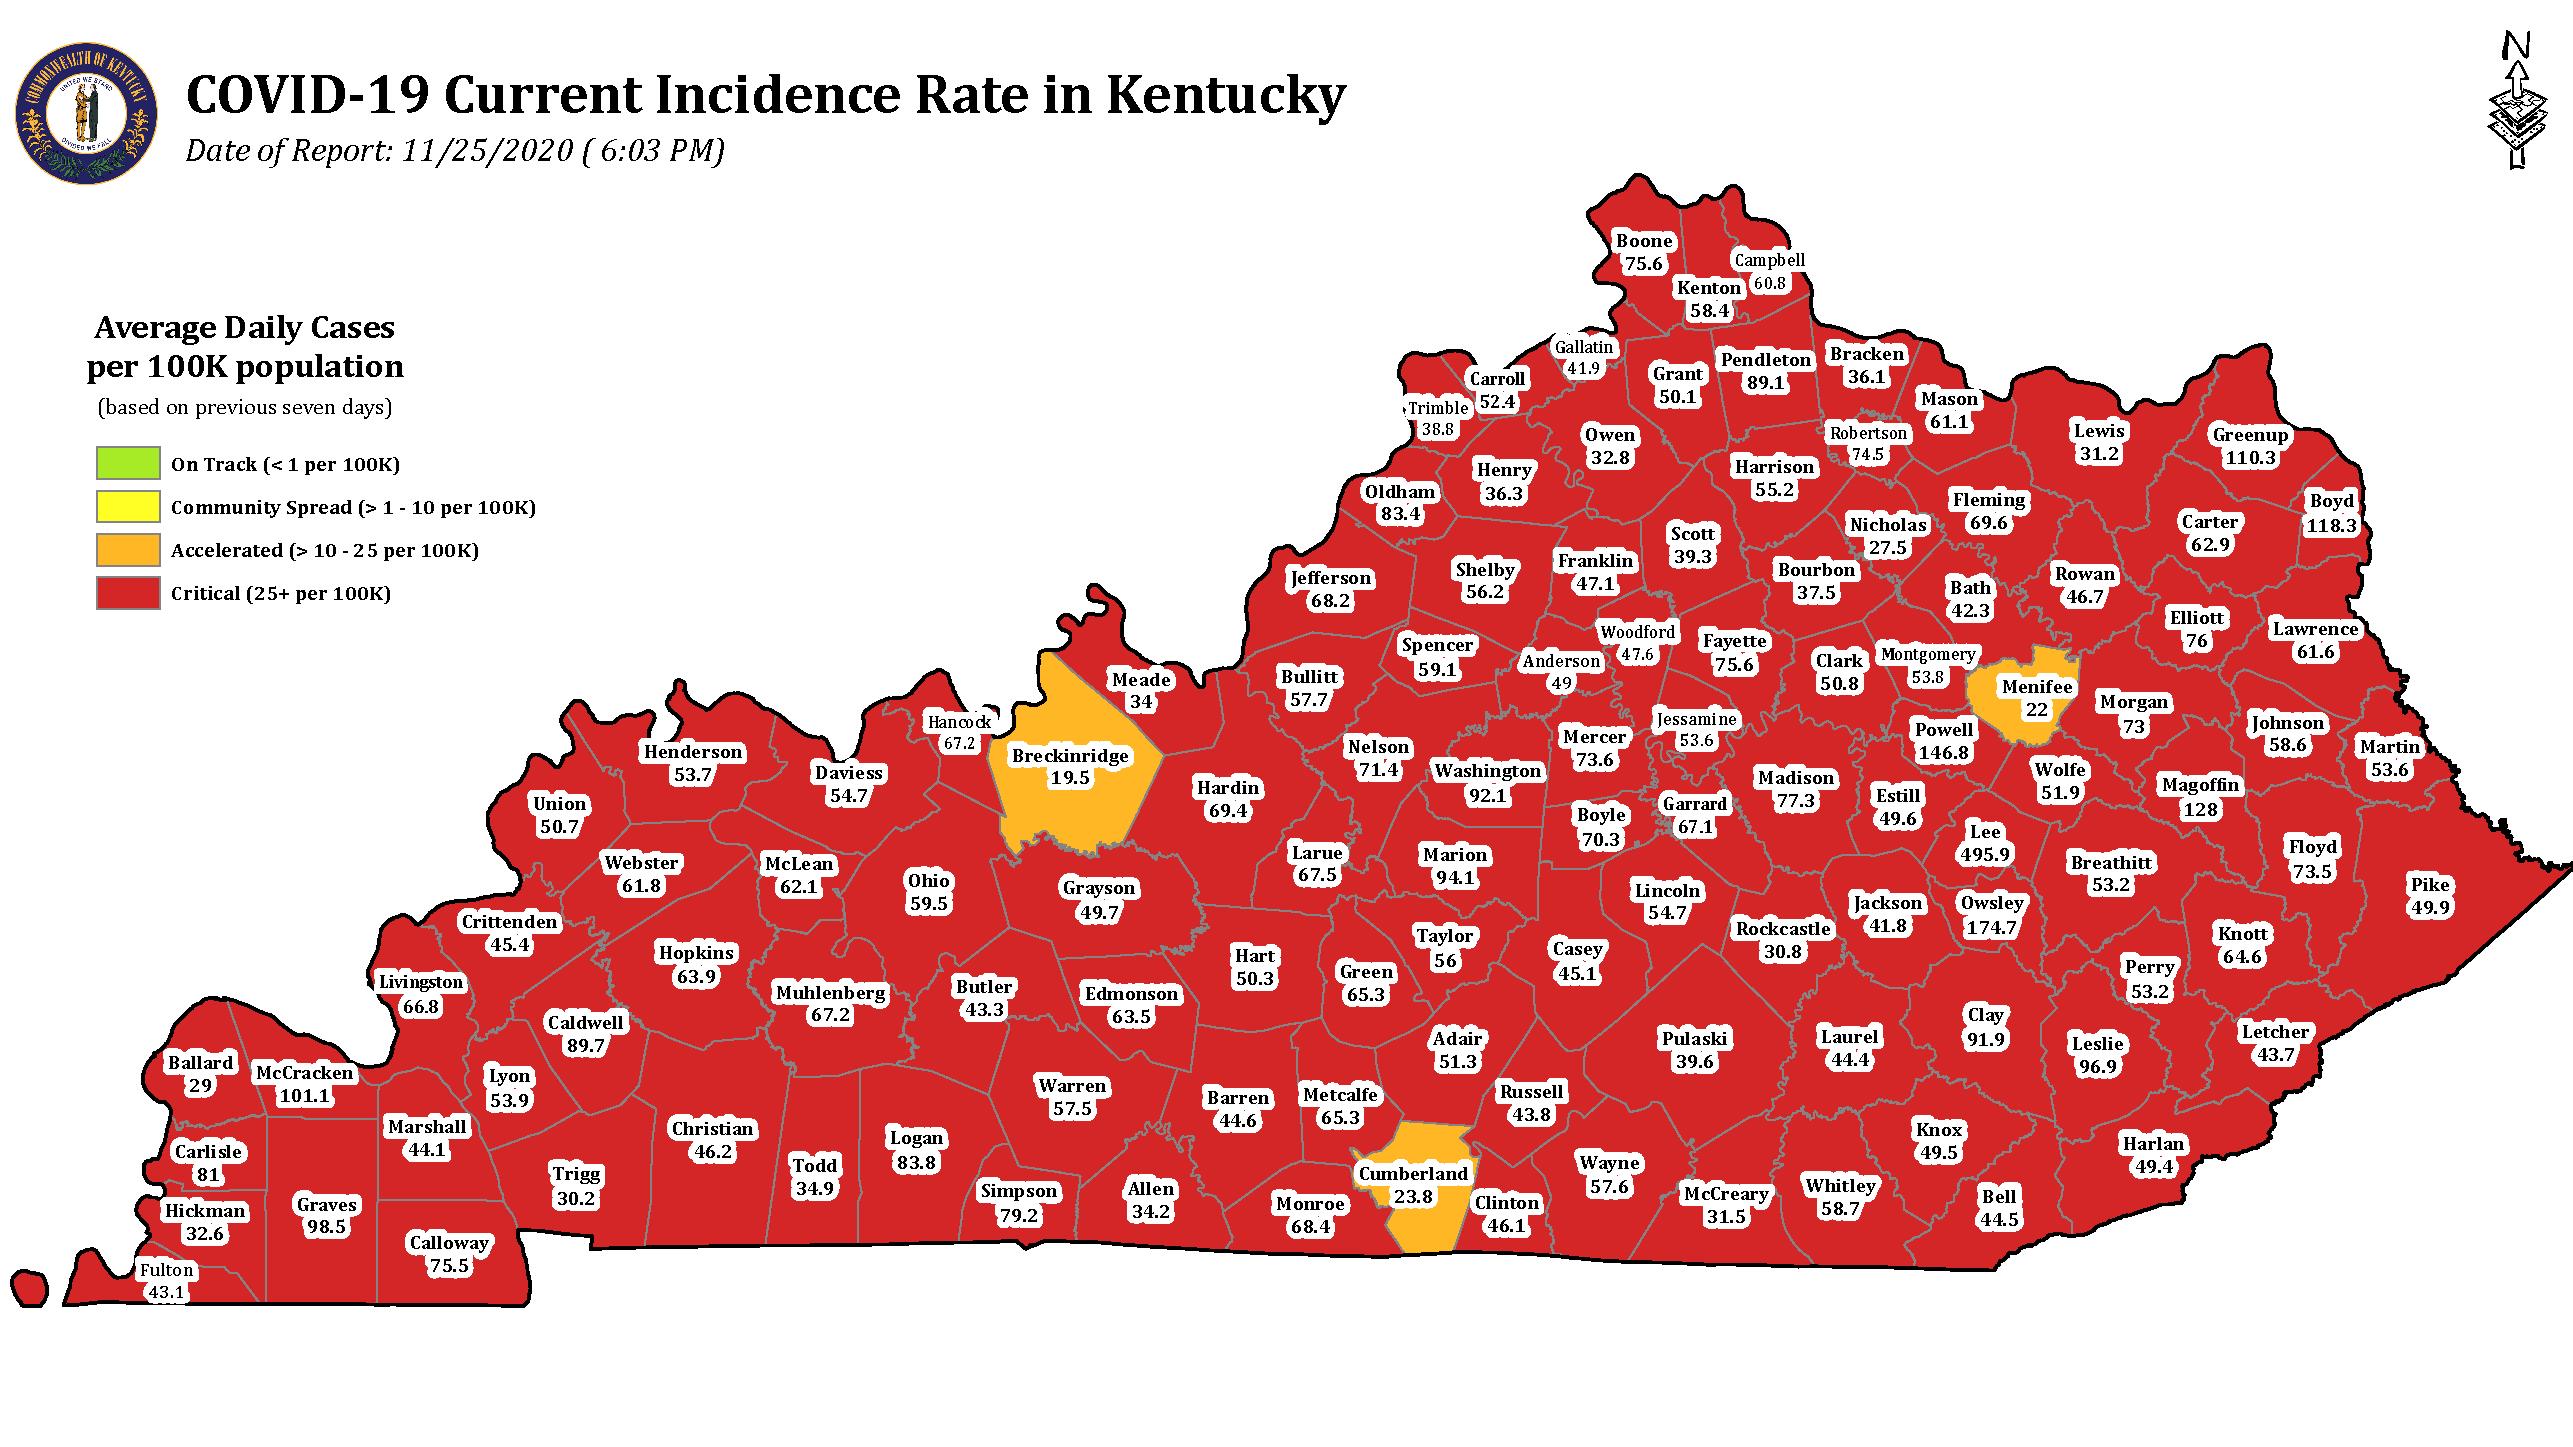 Virus continues to spread across Kentucky